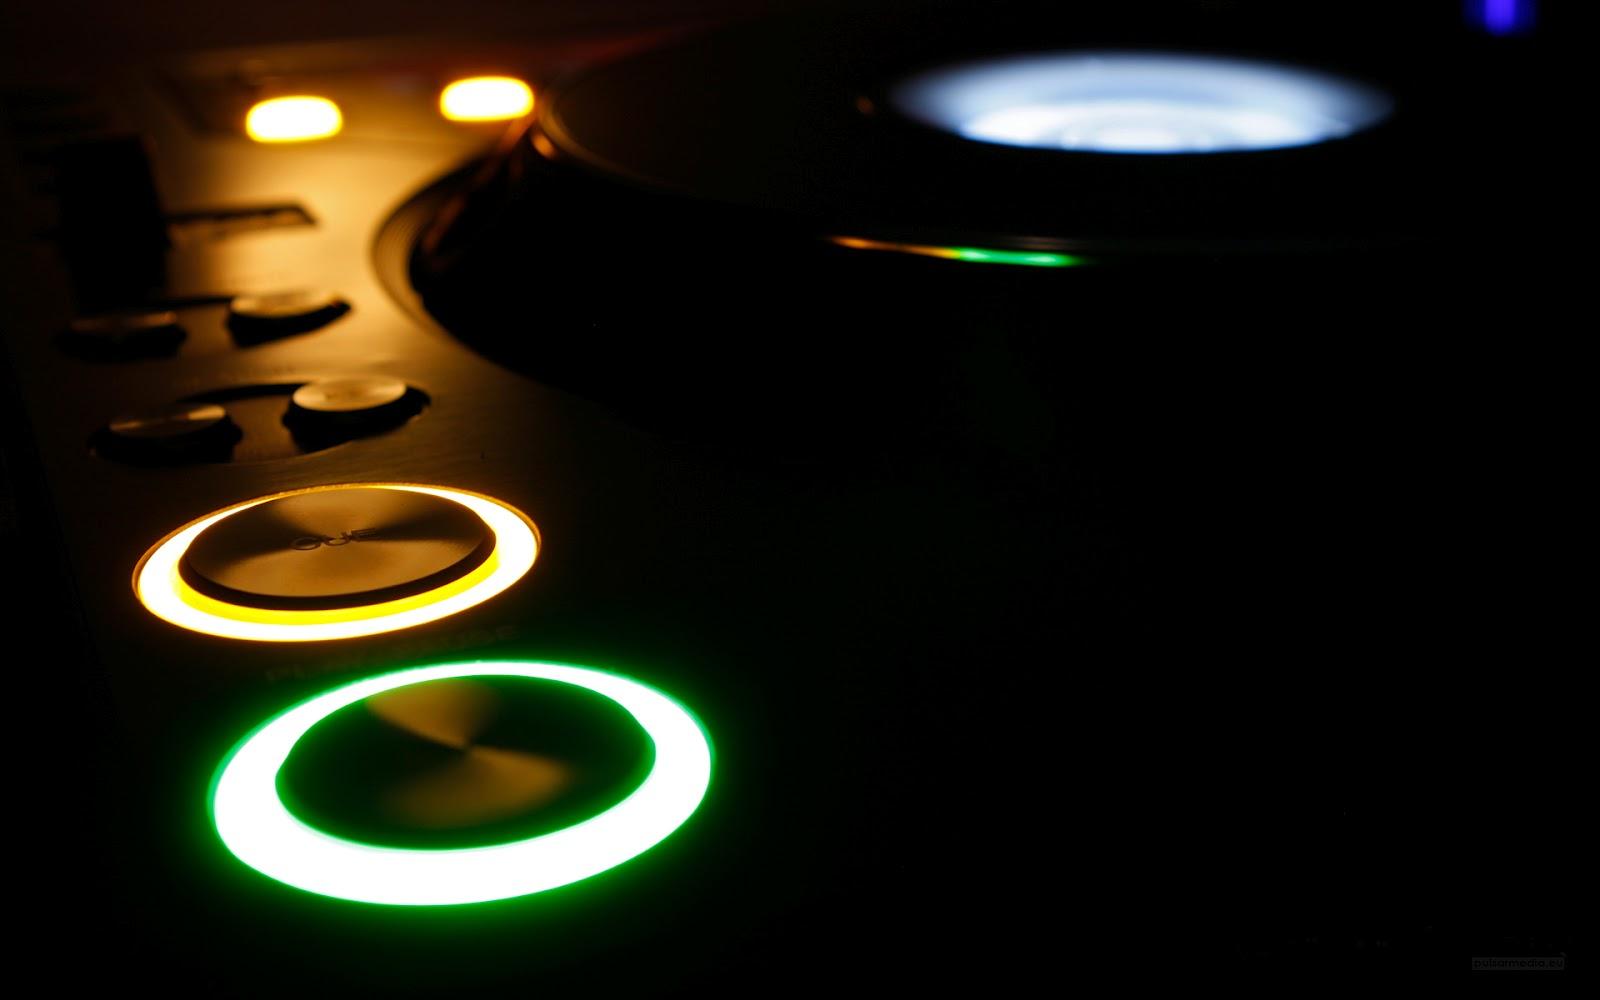 http://1.bp.blogspot.com/-yuP5g3aoG1Y/T9Og9hcSCYI/AAAAAAAACIA/UMramxxvYiQ/s1600/Pioneer-music-wallpapers.jpg